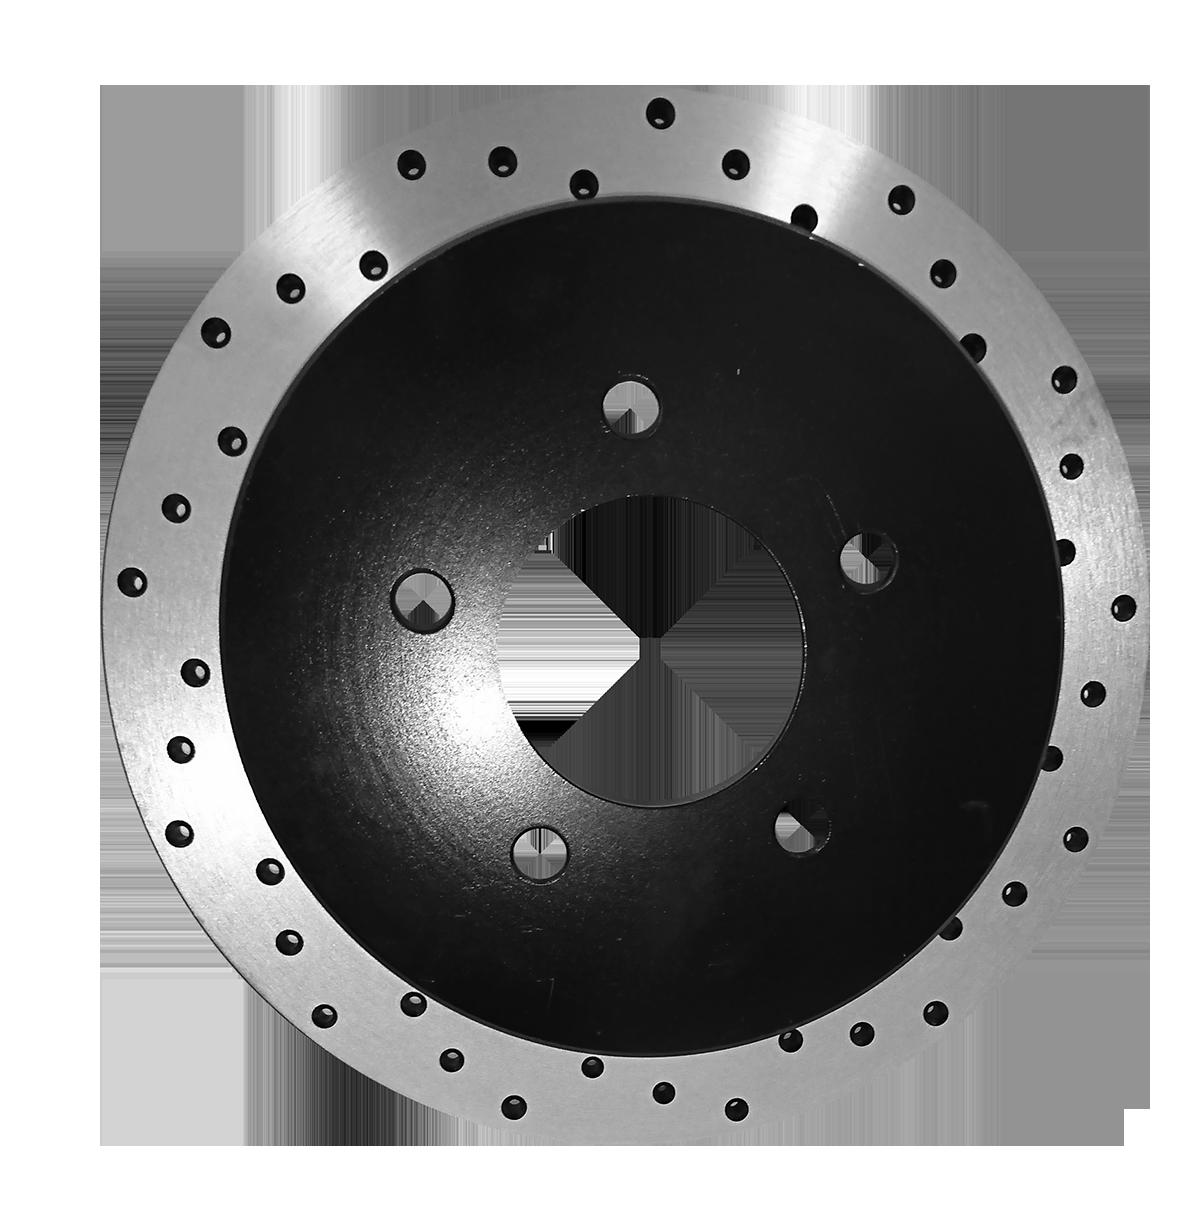 [Rear E-Coat Drilled Brake Rotors Ceramic Pads] Fit 14-16 Nissan 370Z SPC - image 2 de 2